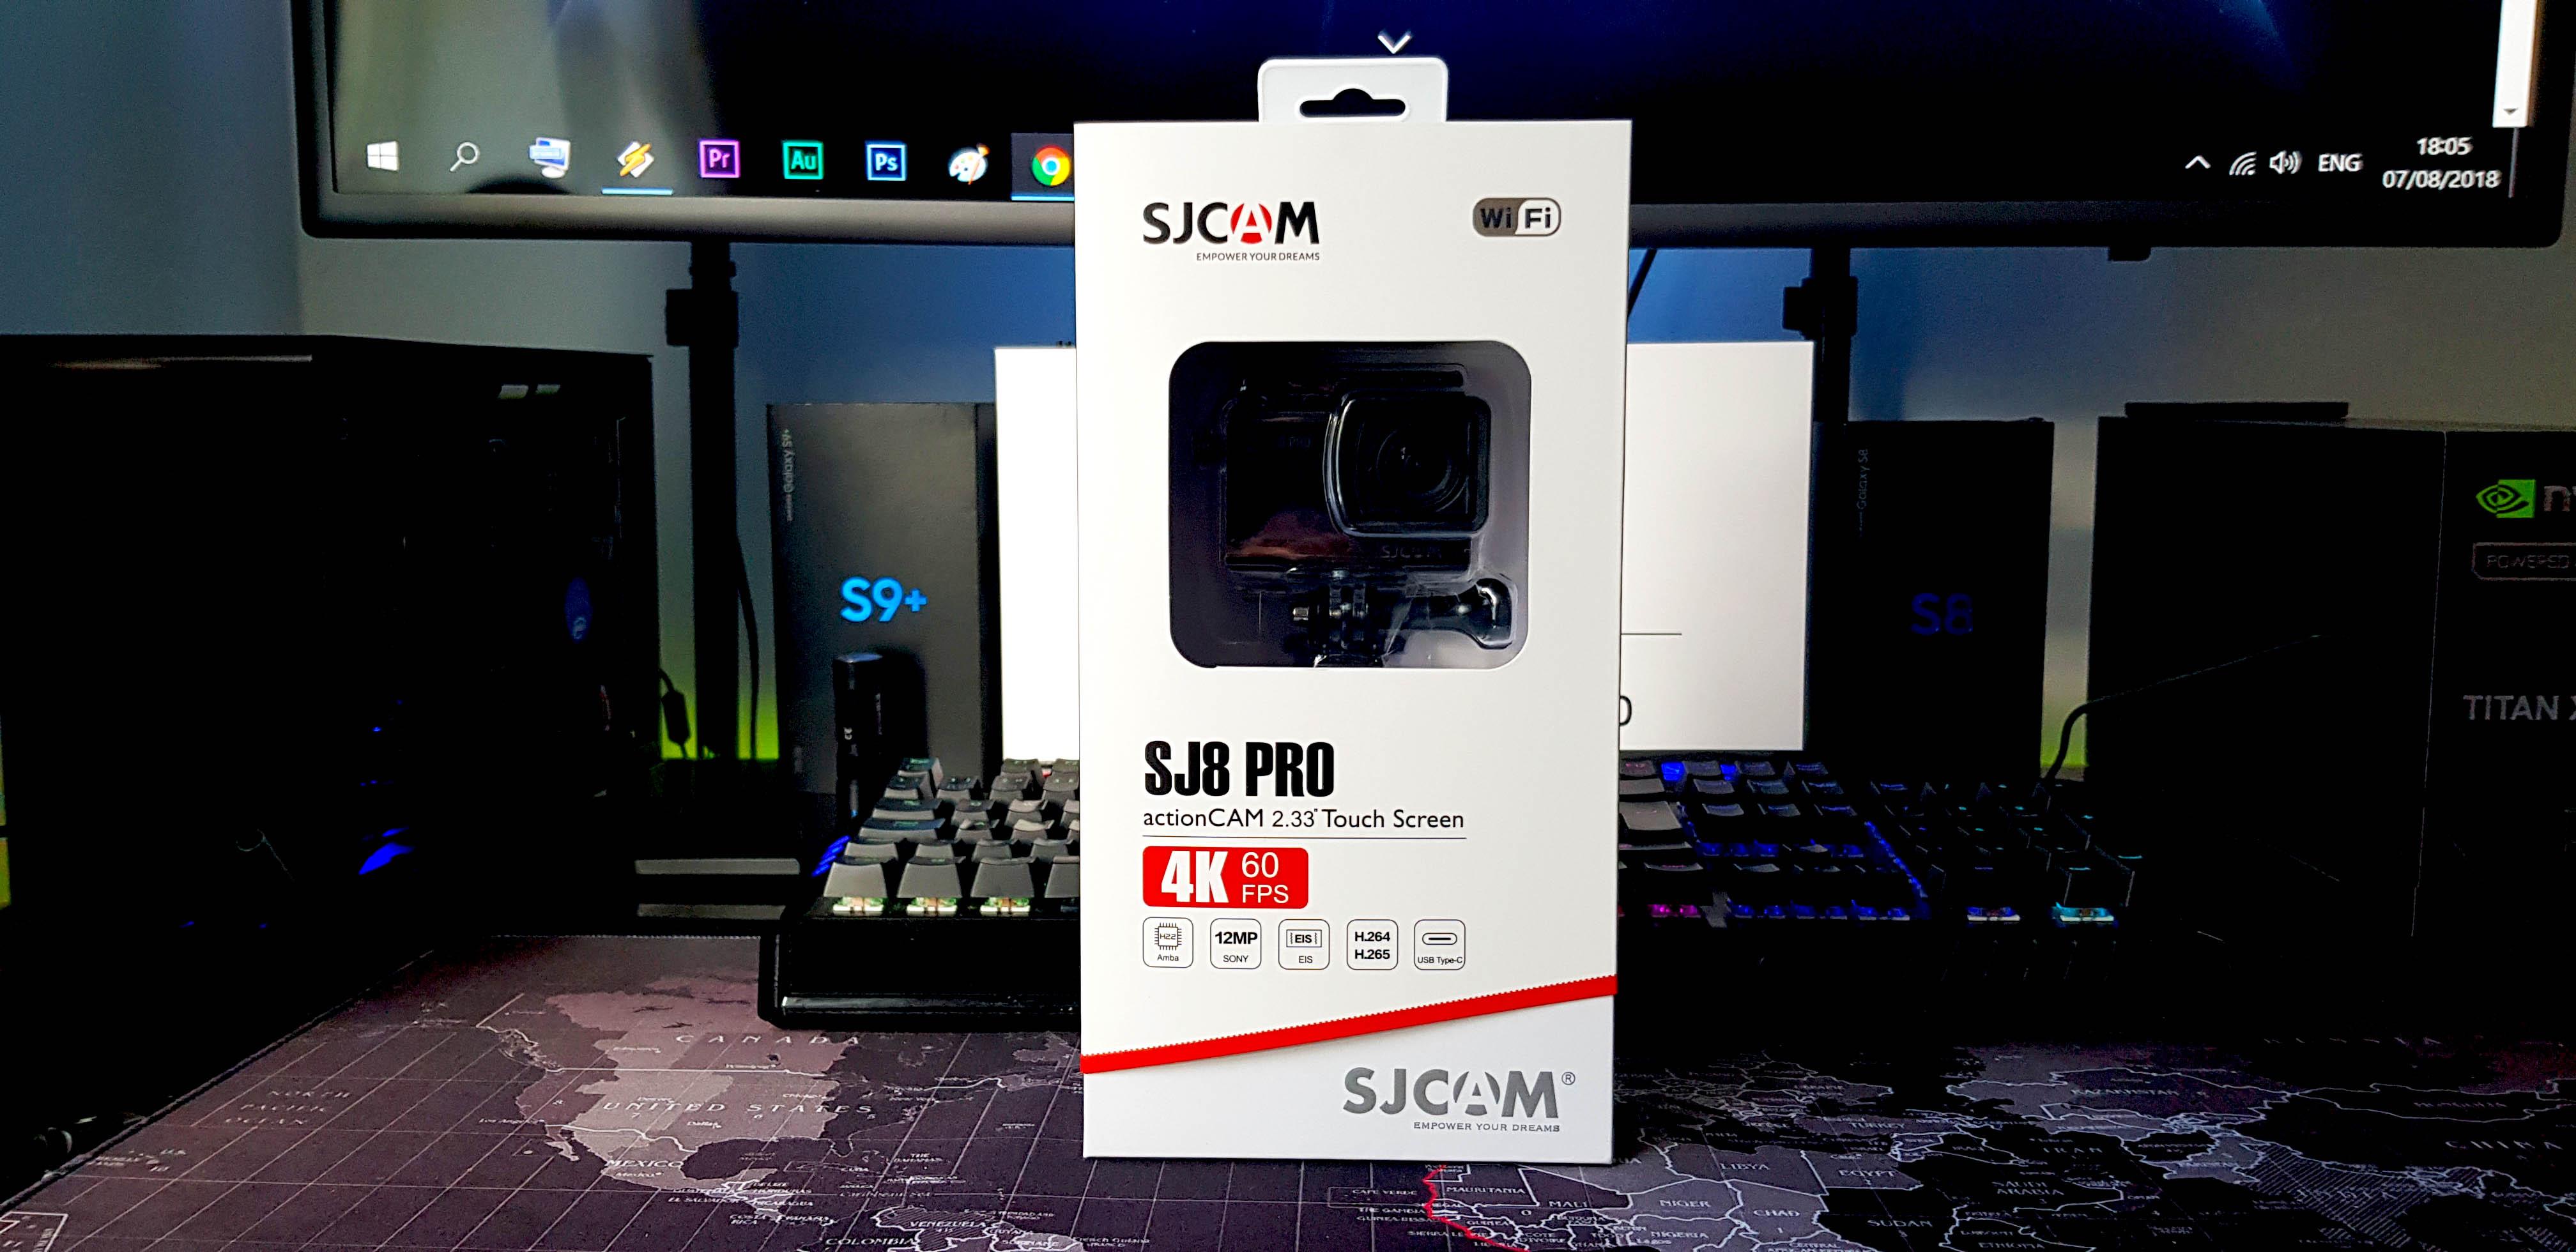 SJCAM SJ8 PRO Mastering 4K60FPS | Glob3trotters